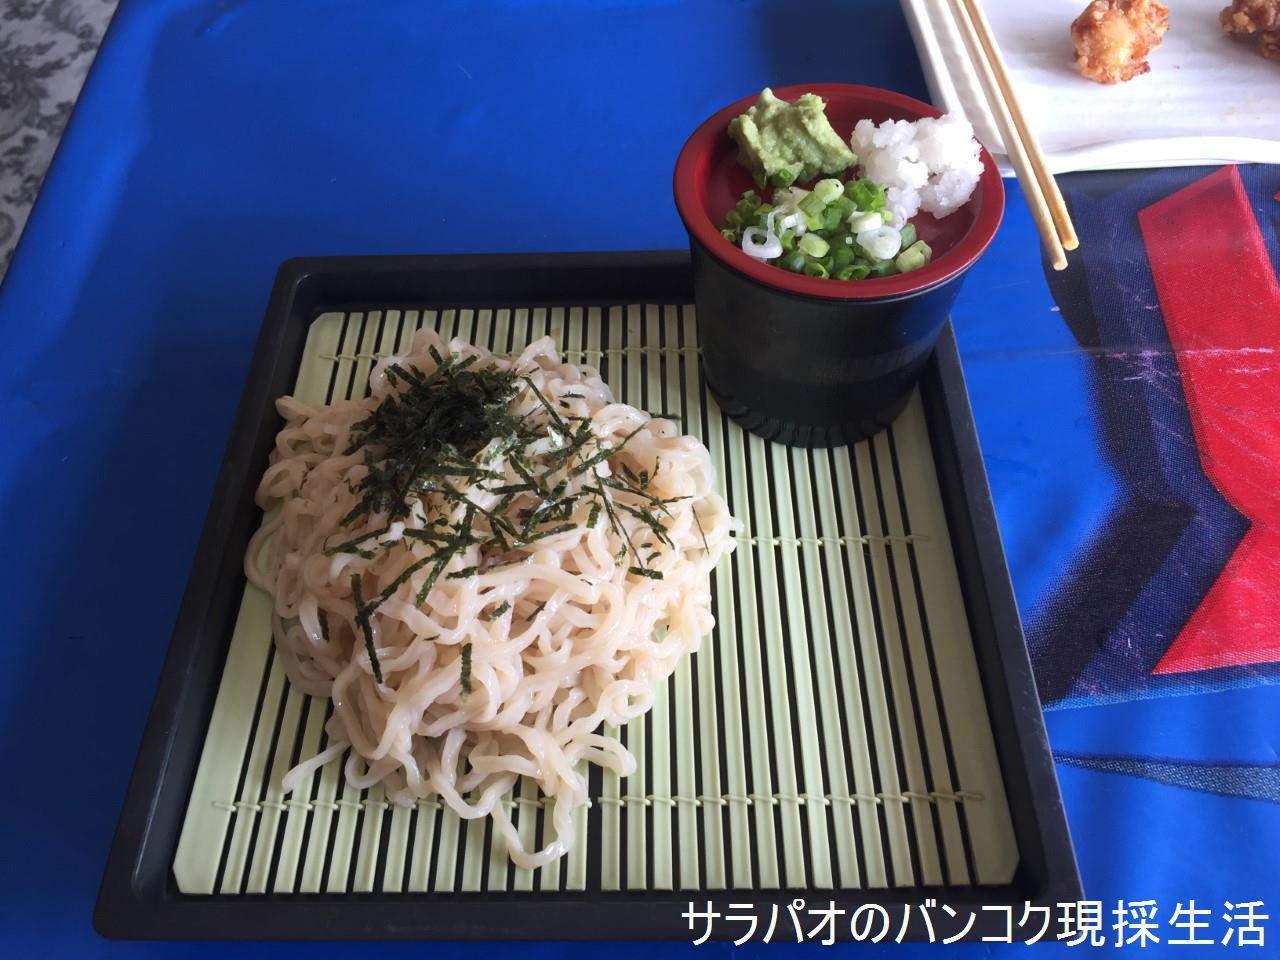 MenyaIchi_09.jpg